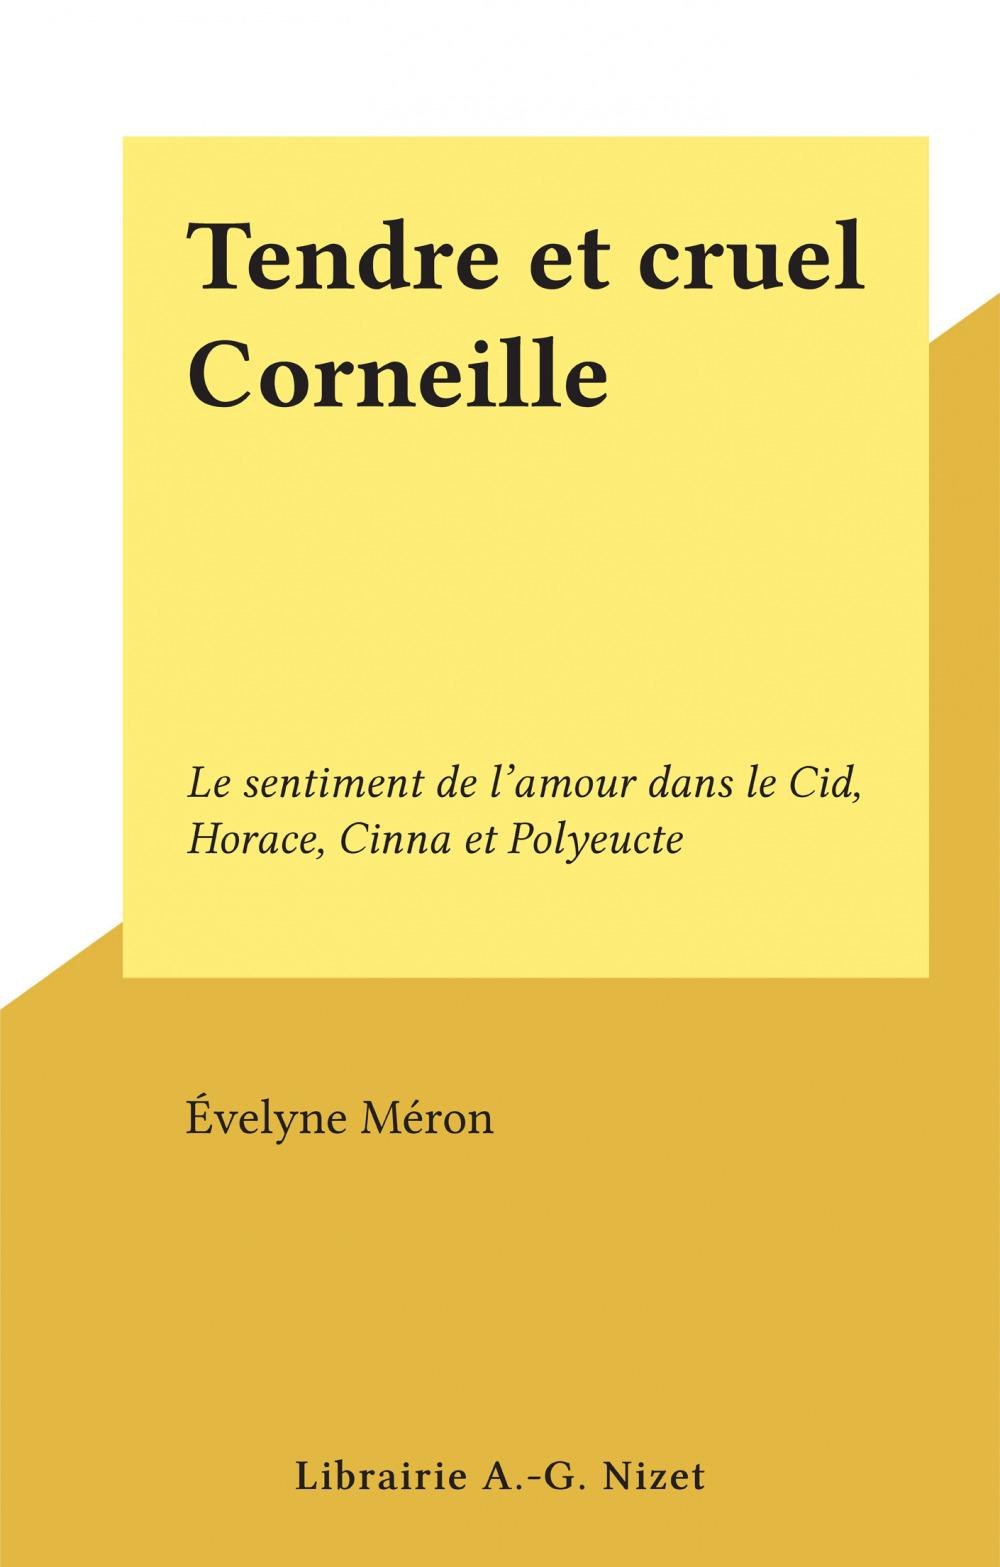 Tendre et cruel Corneille